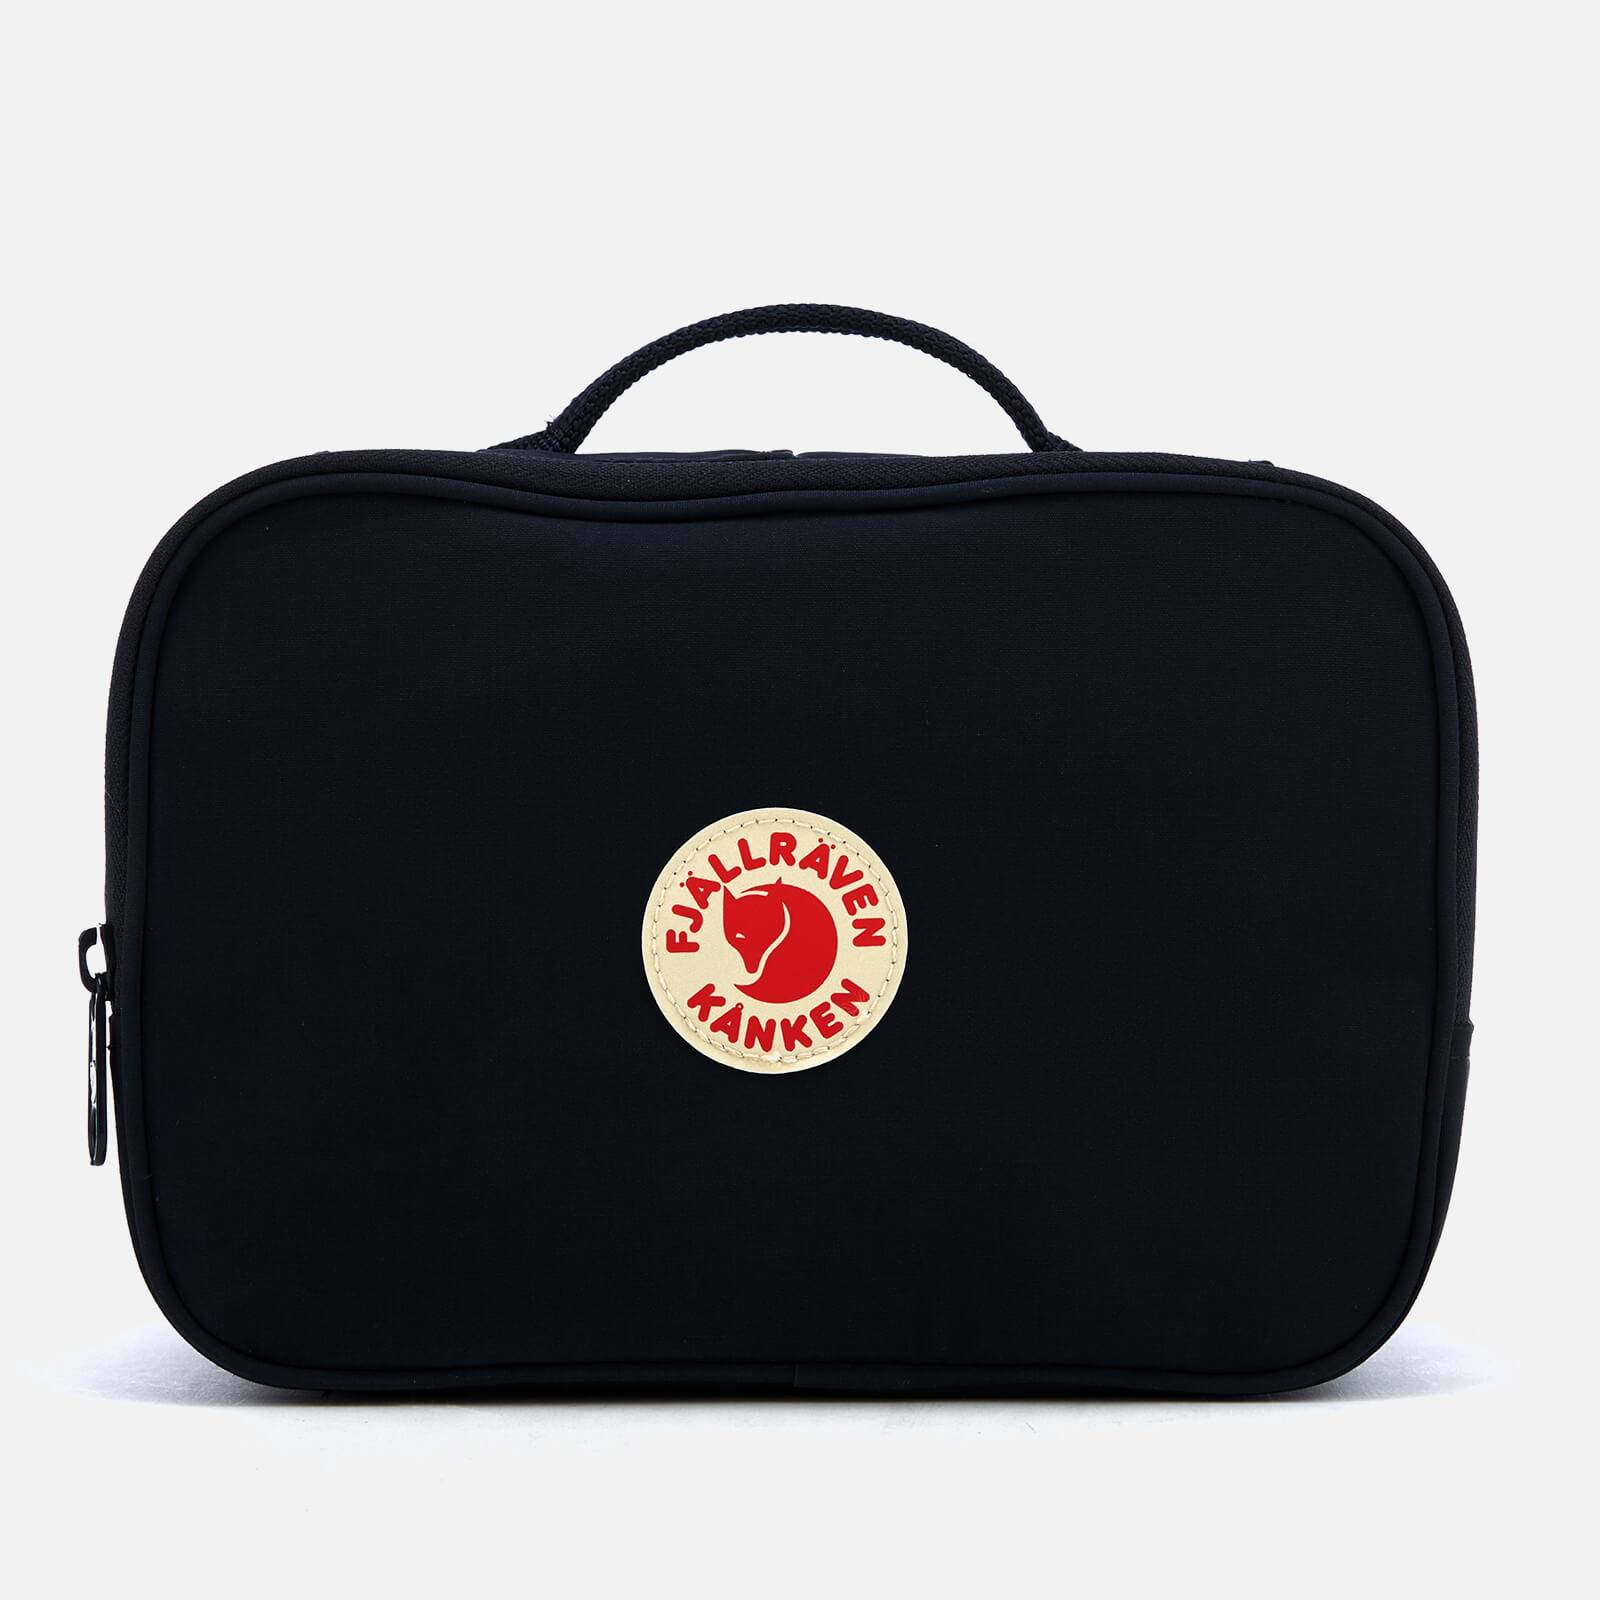 Fjallraven Kanken Toiletry Bag - Navy